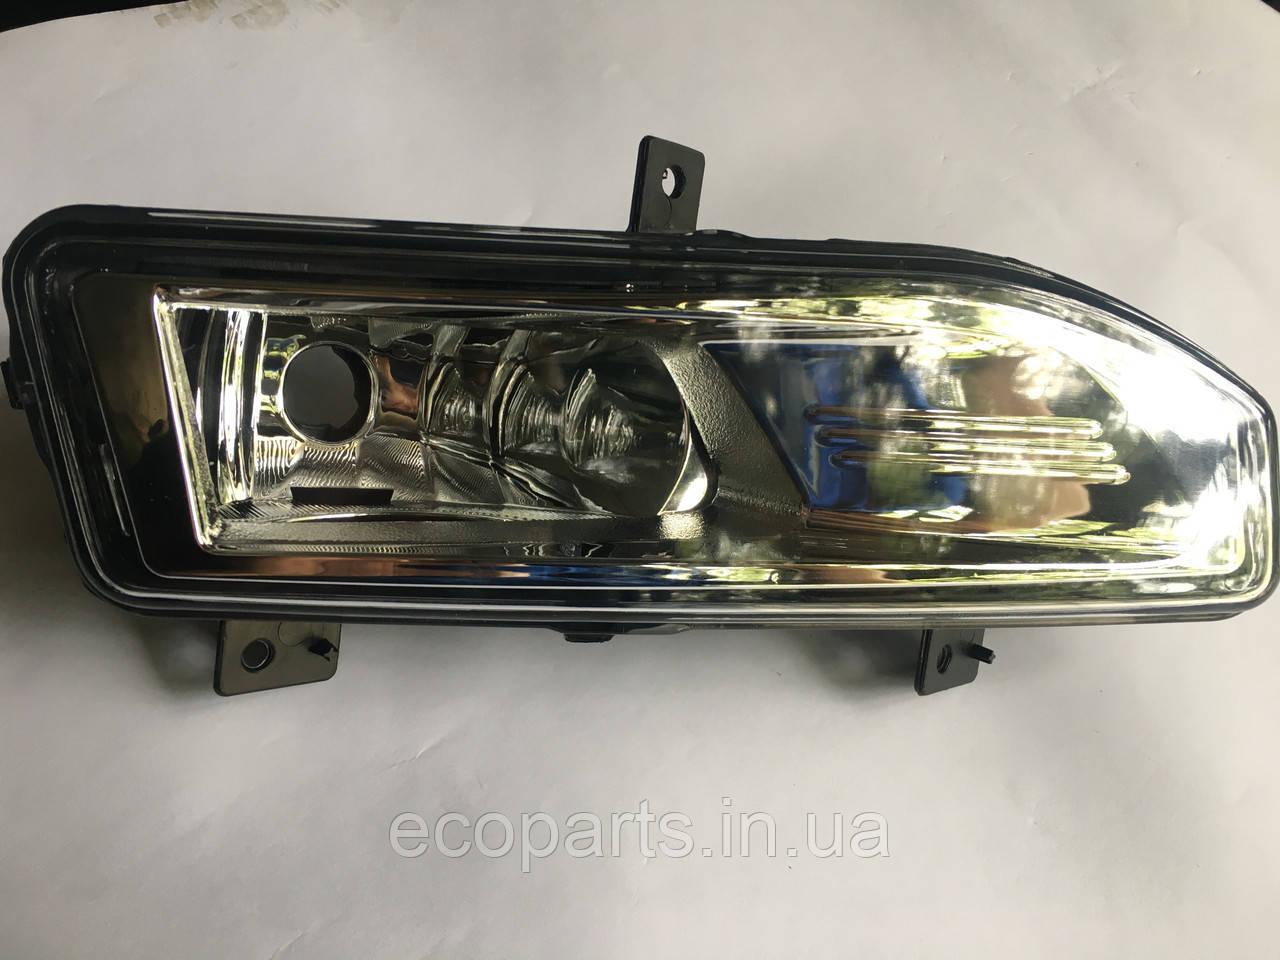 Фара противотуманная  Nissan Leaf 2018 левая (Копия)